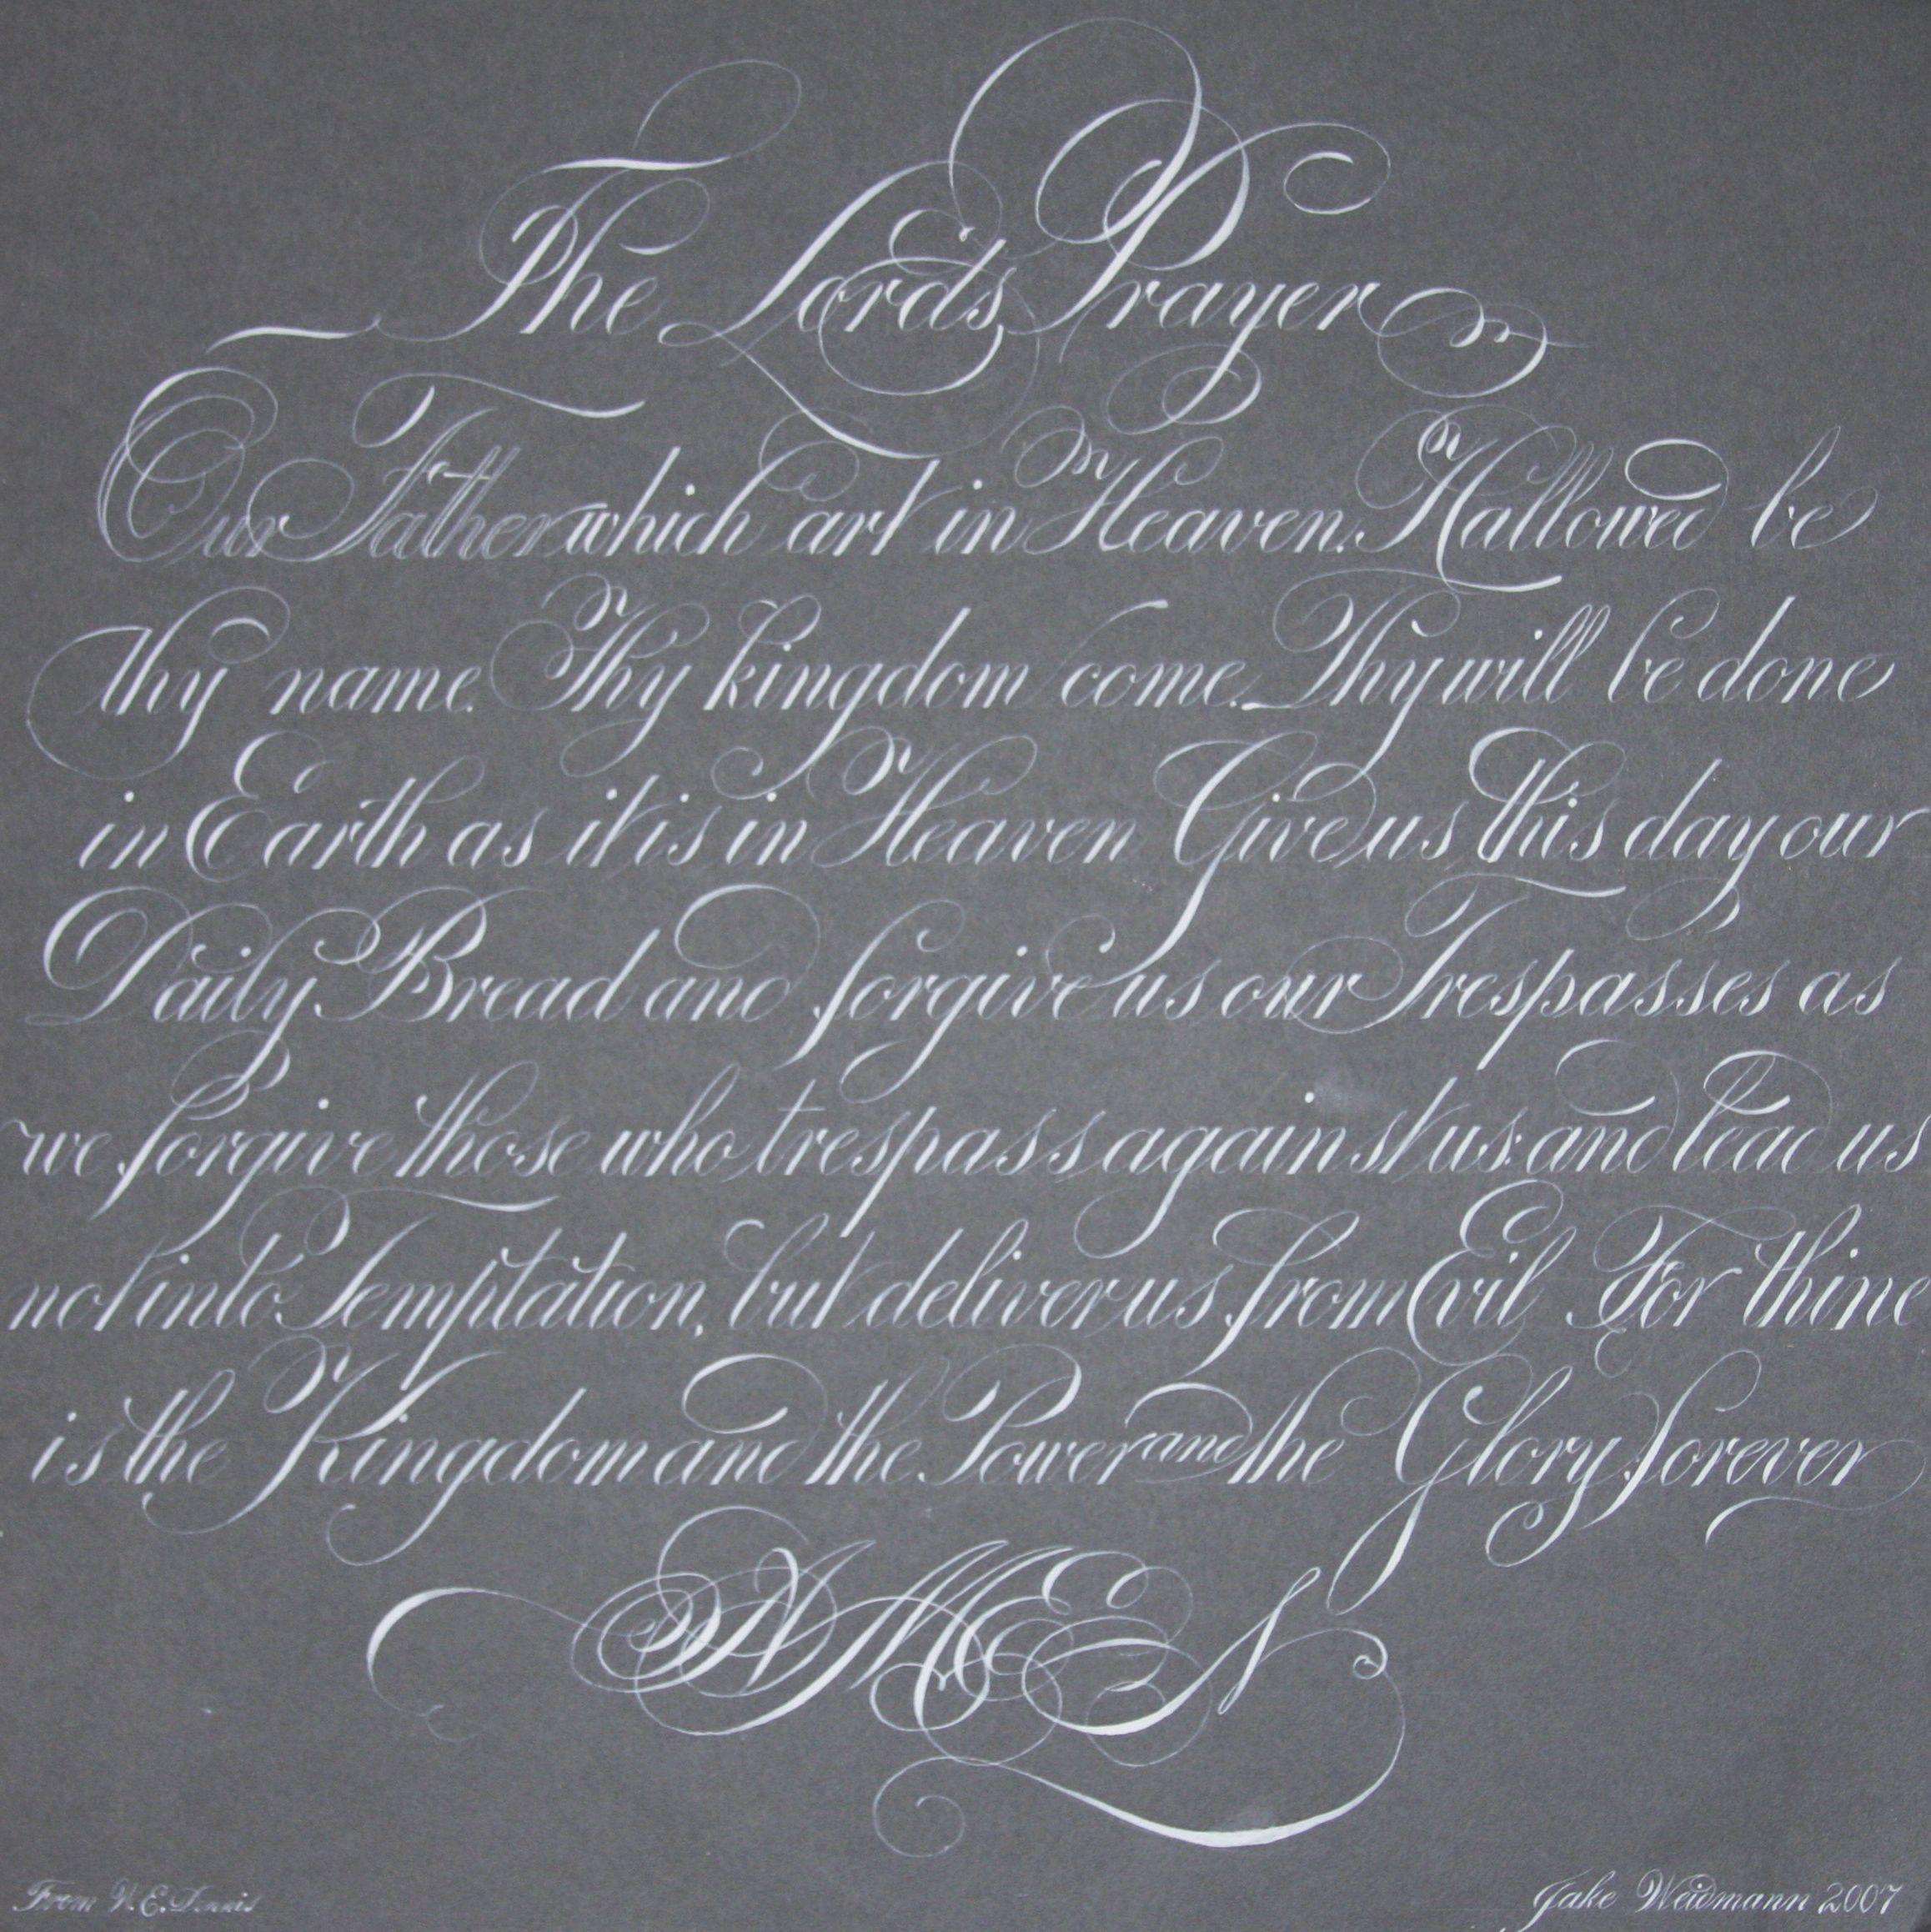 the lord u0027s prayer in engrosser u0027s script by jake weidmann this